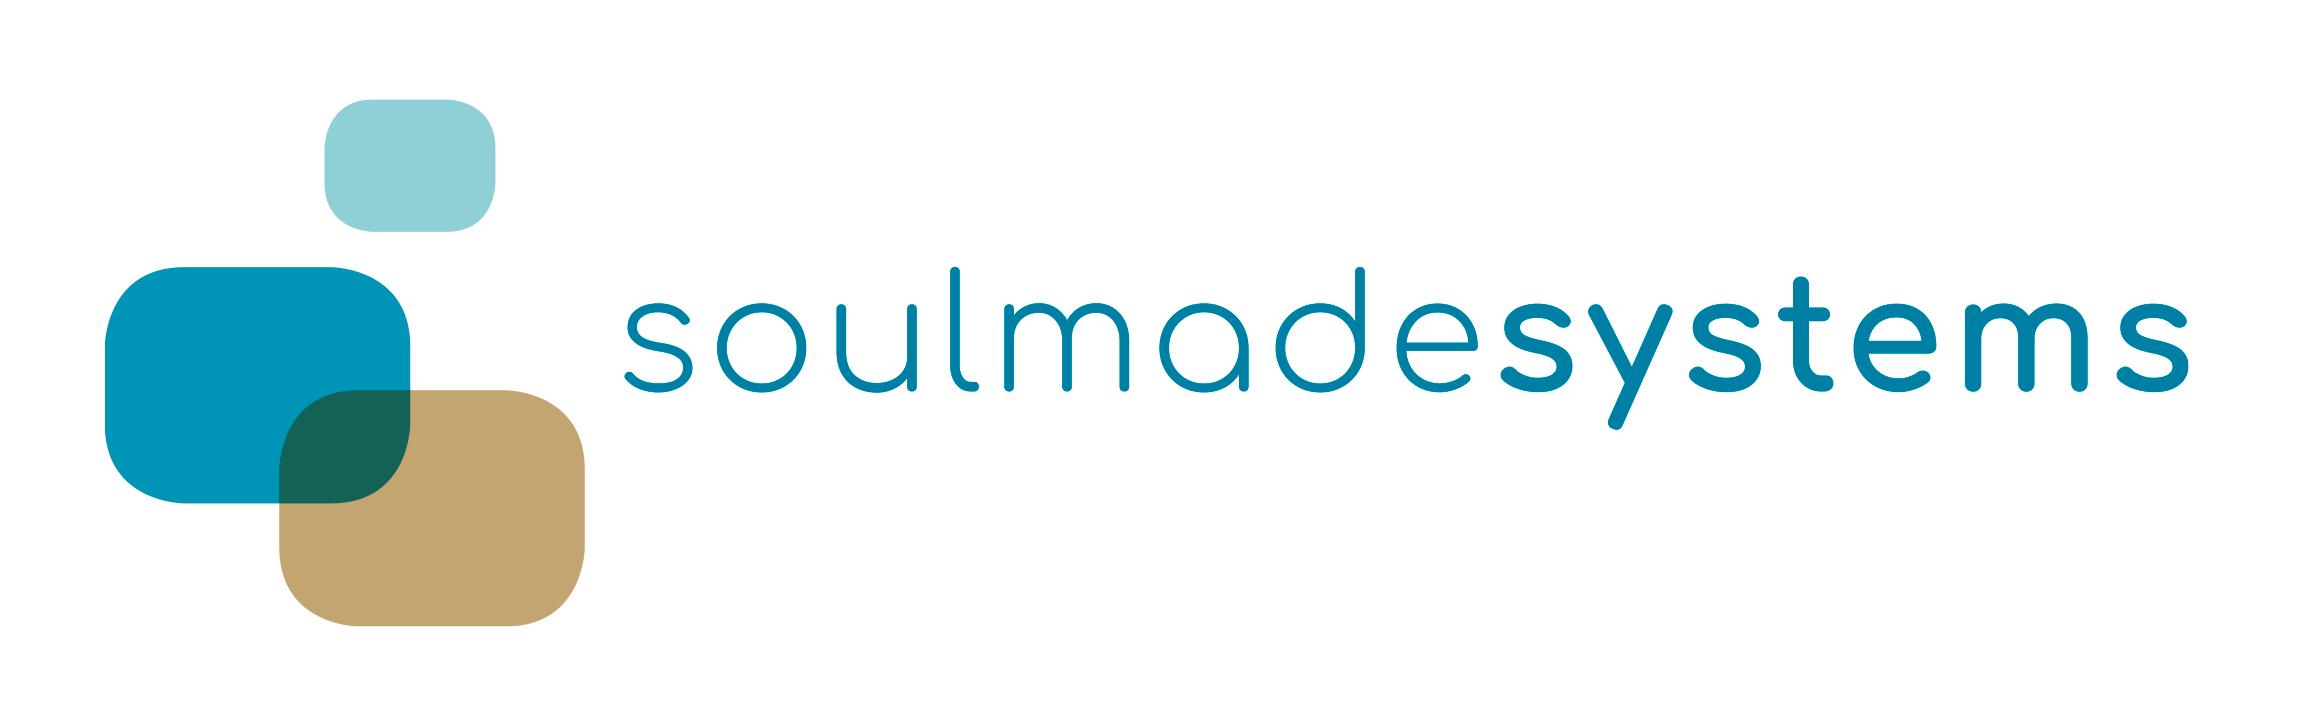 soulmadesystems